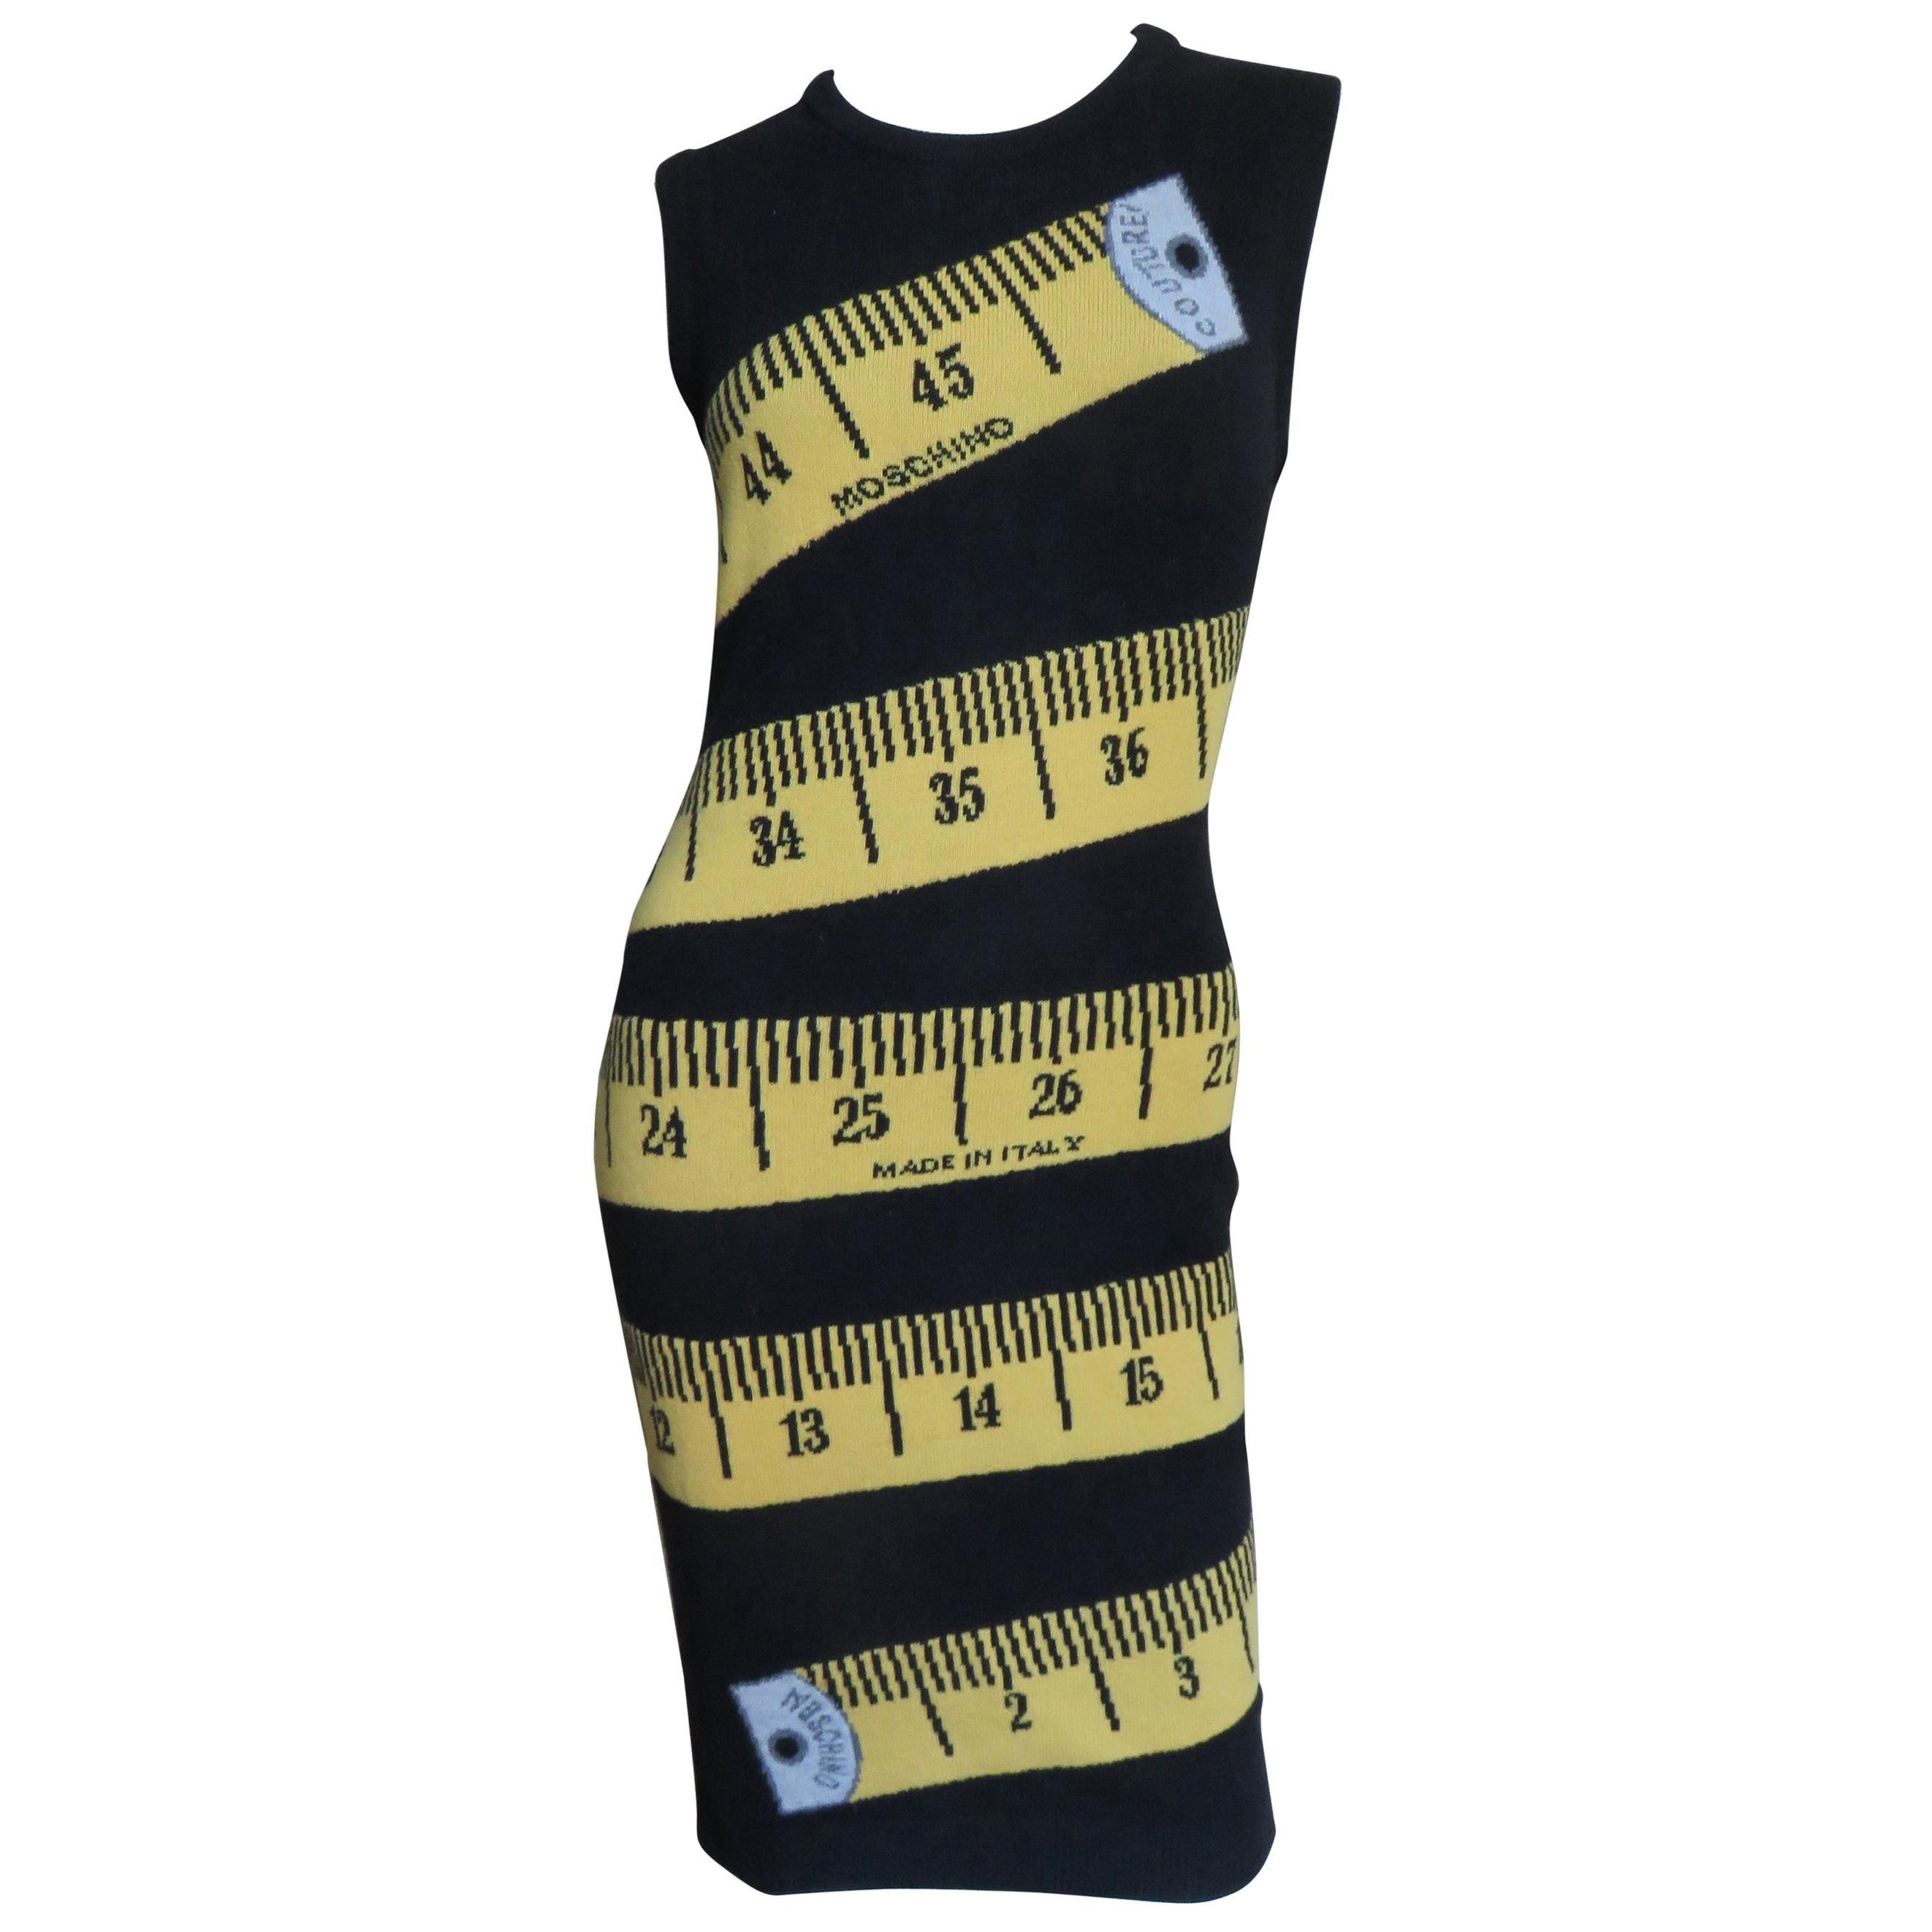 Moschino Couture Jeremy Scott Measuring Tape Dress